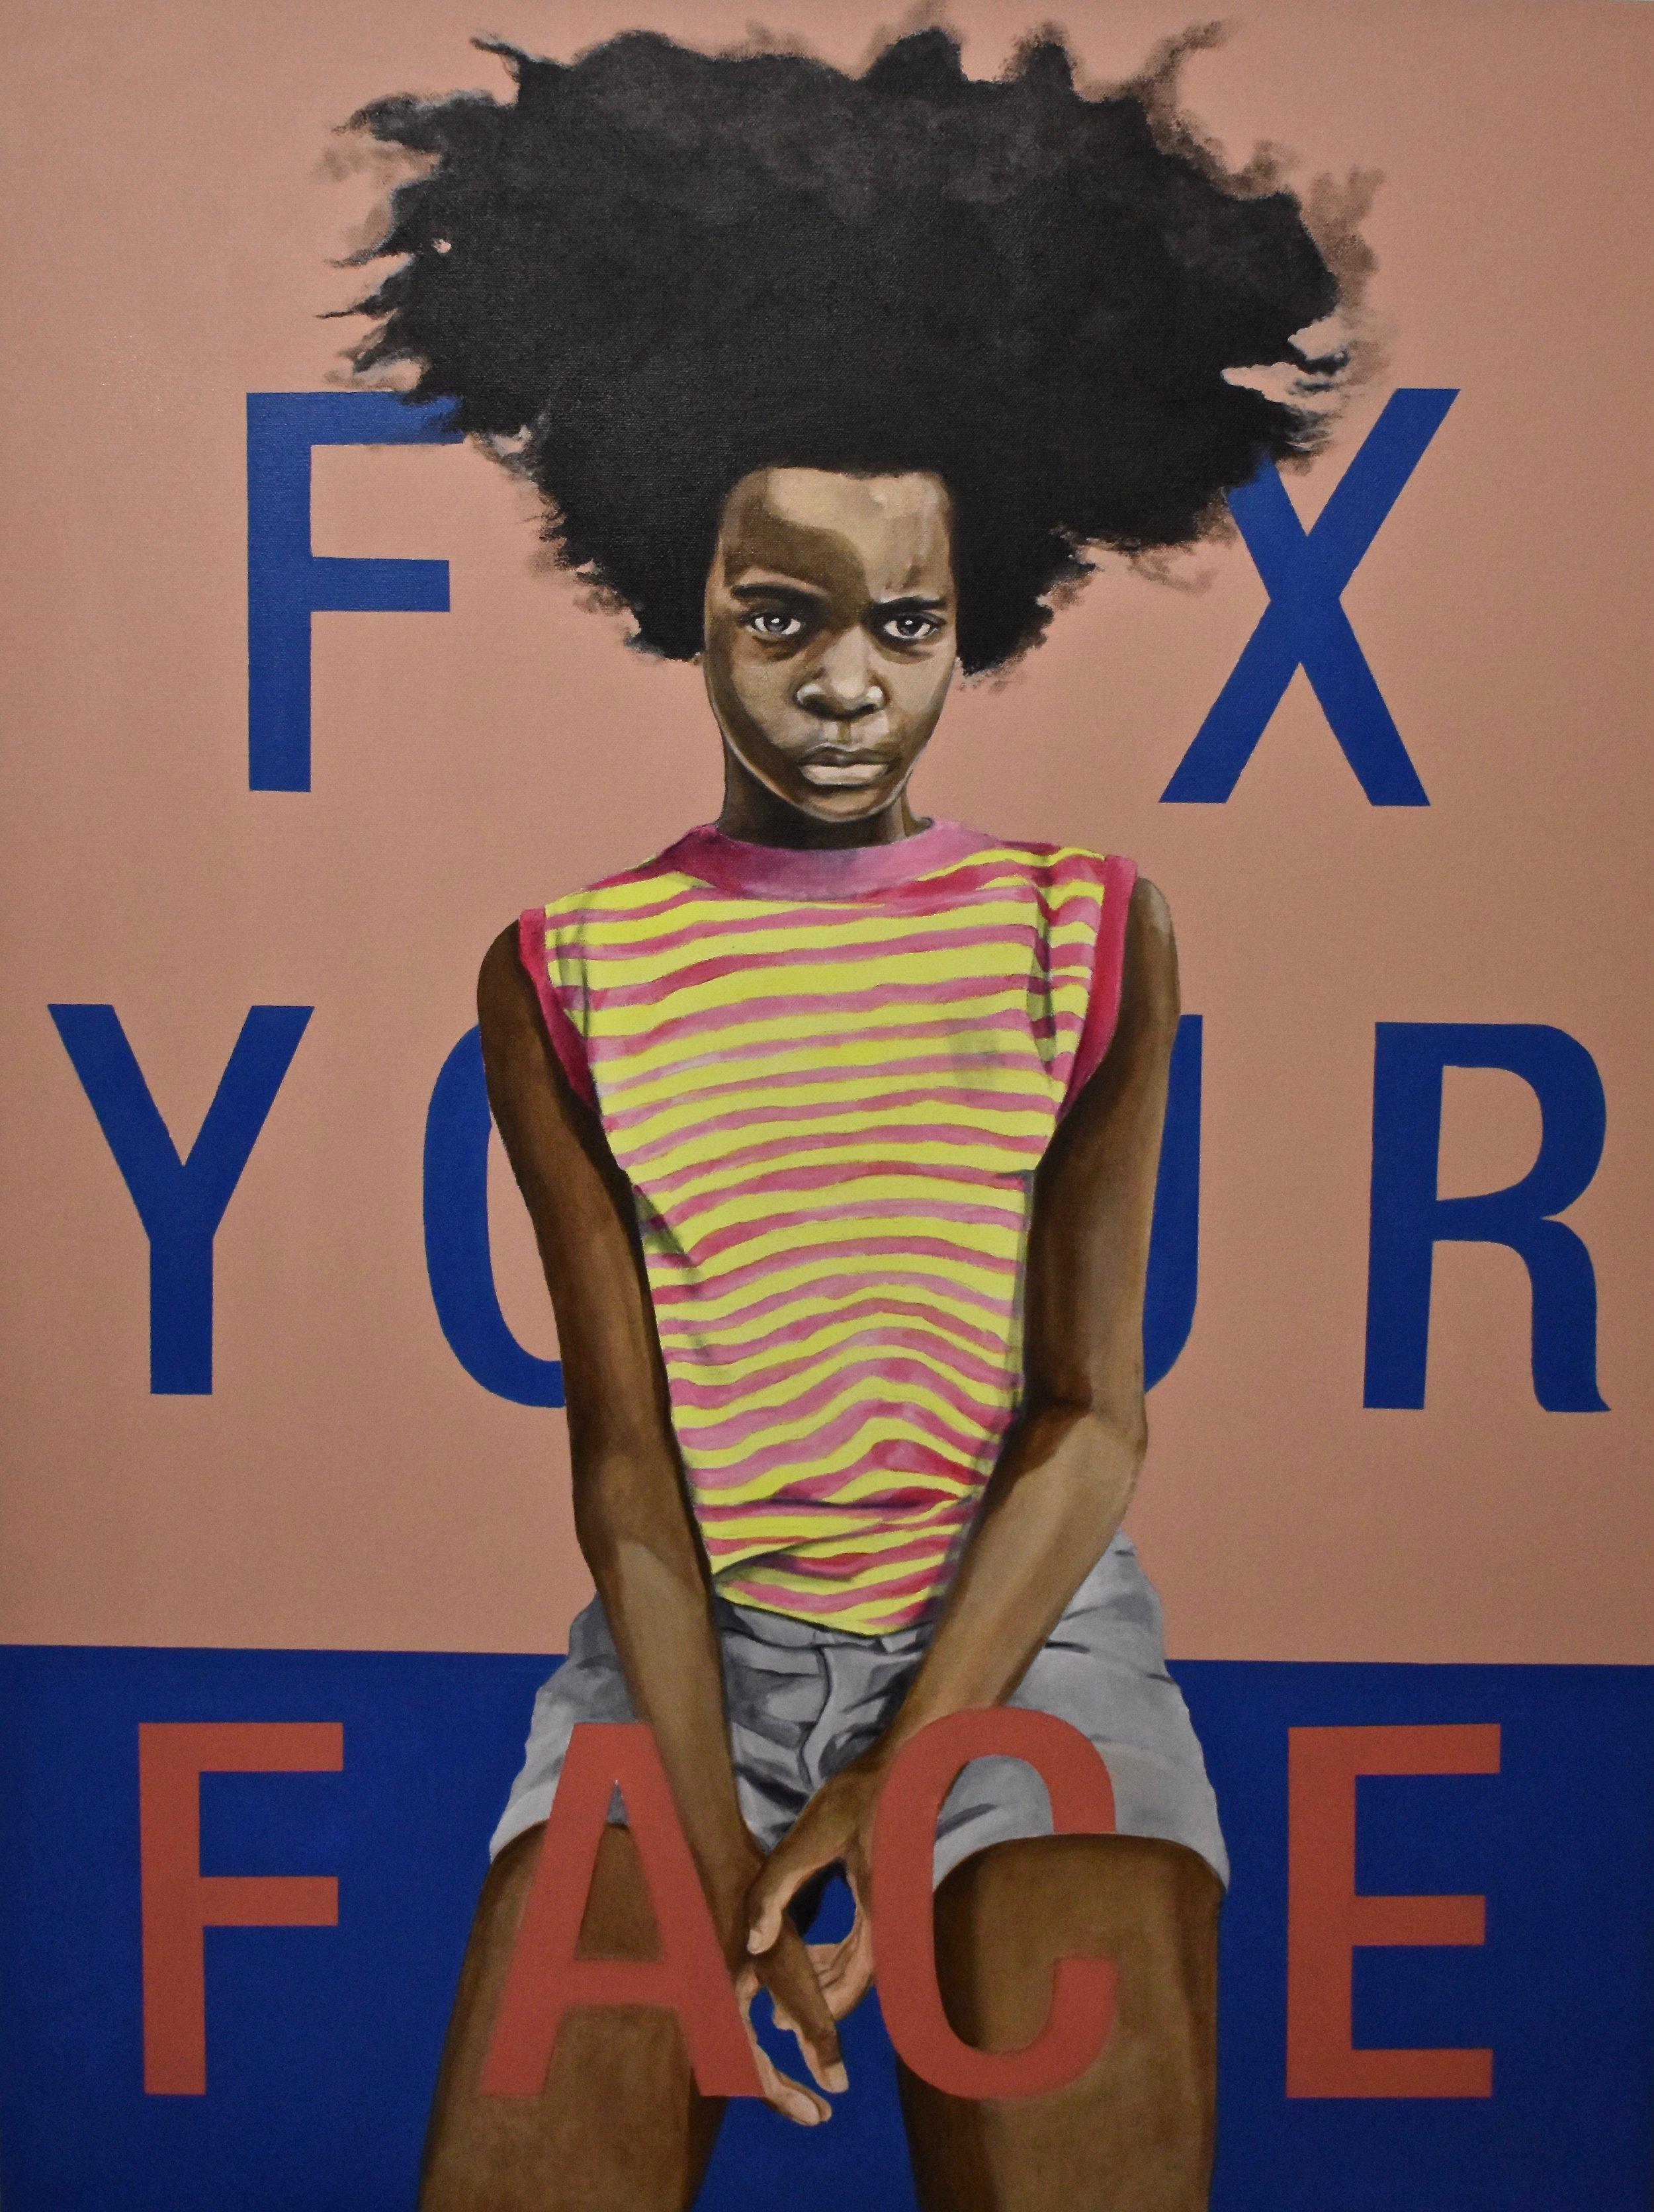 Fix Your Face, Acrylic on canvas, 2019